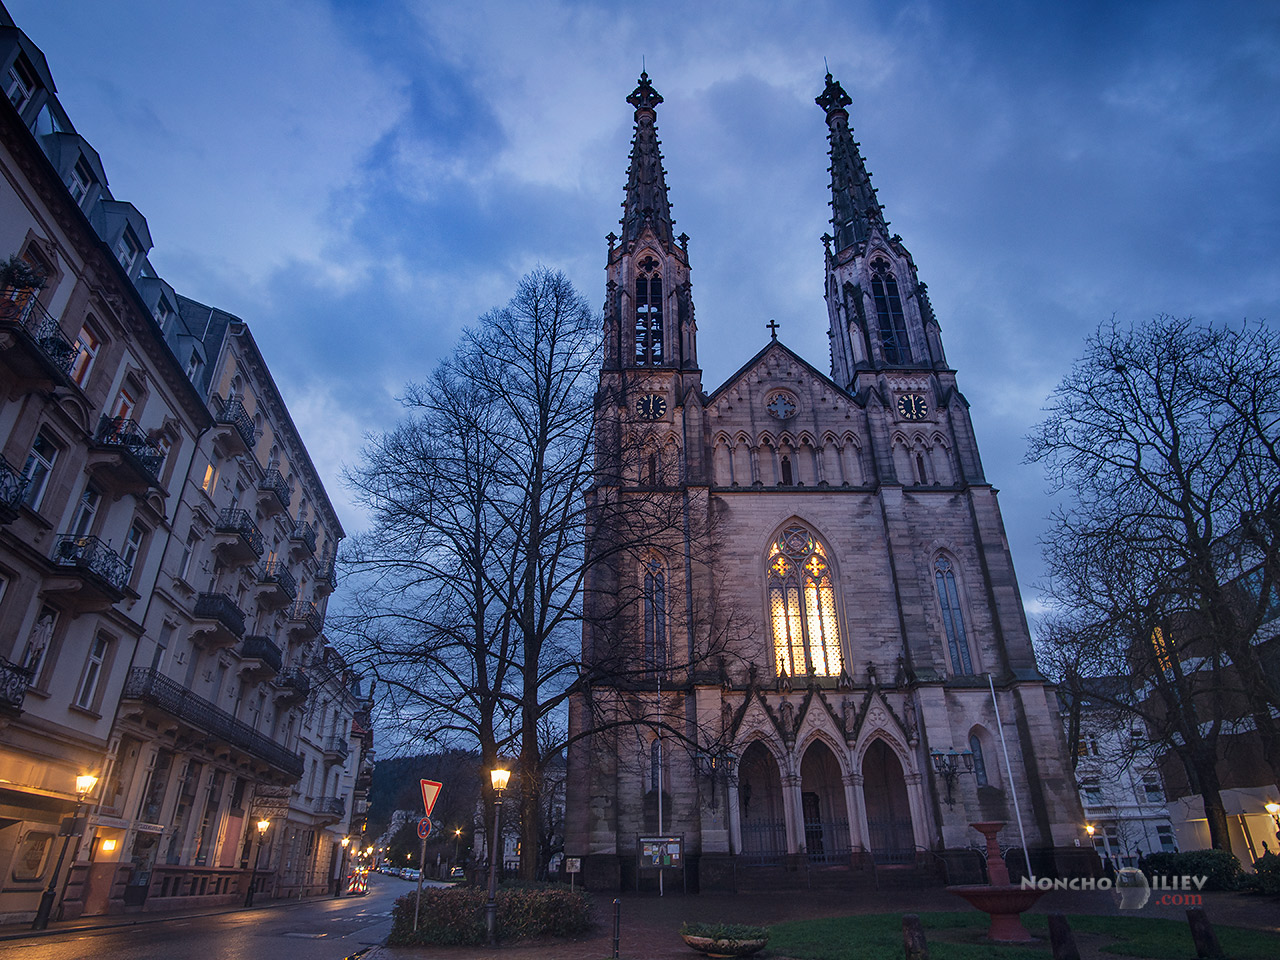 Баден-Баден църква